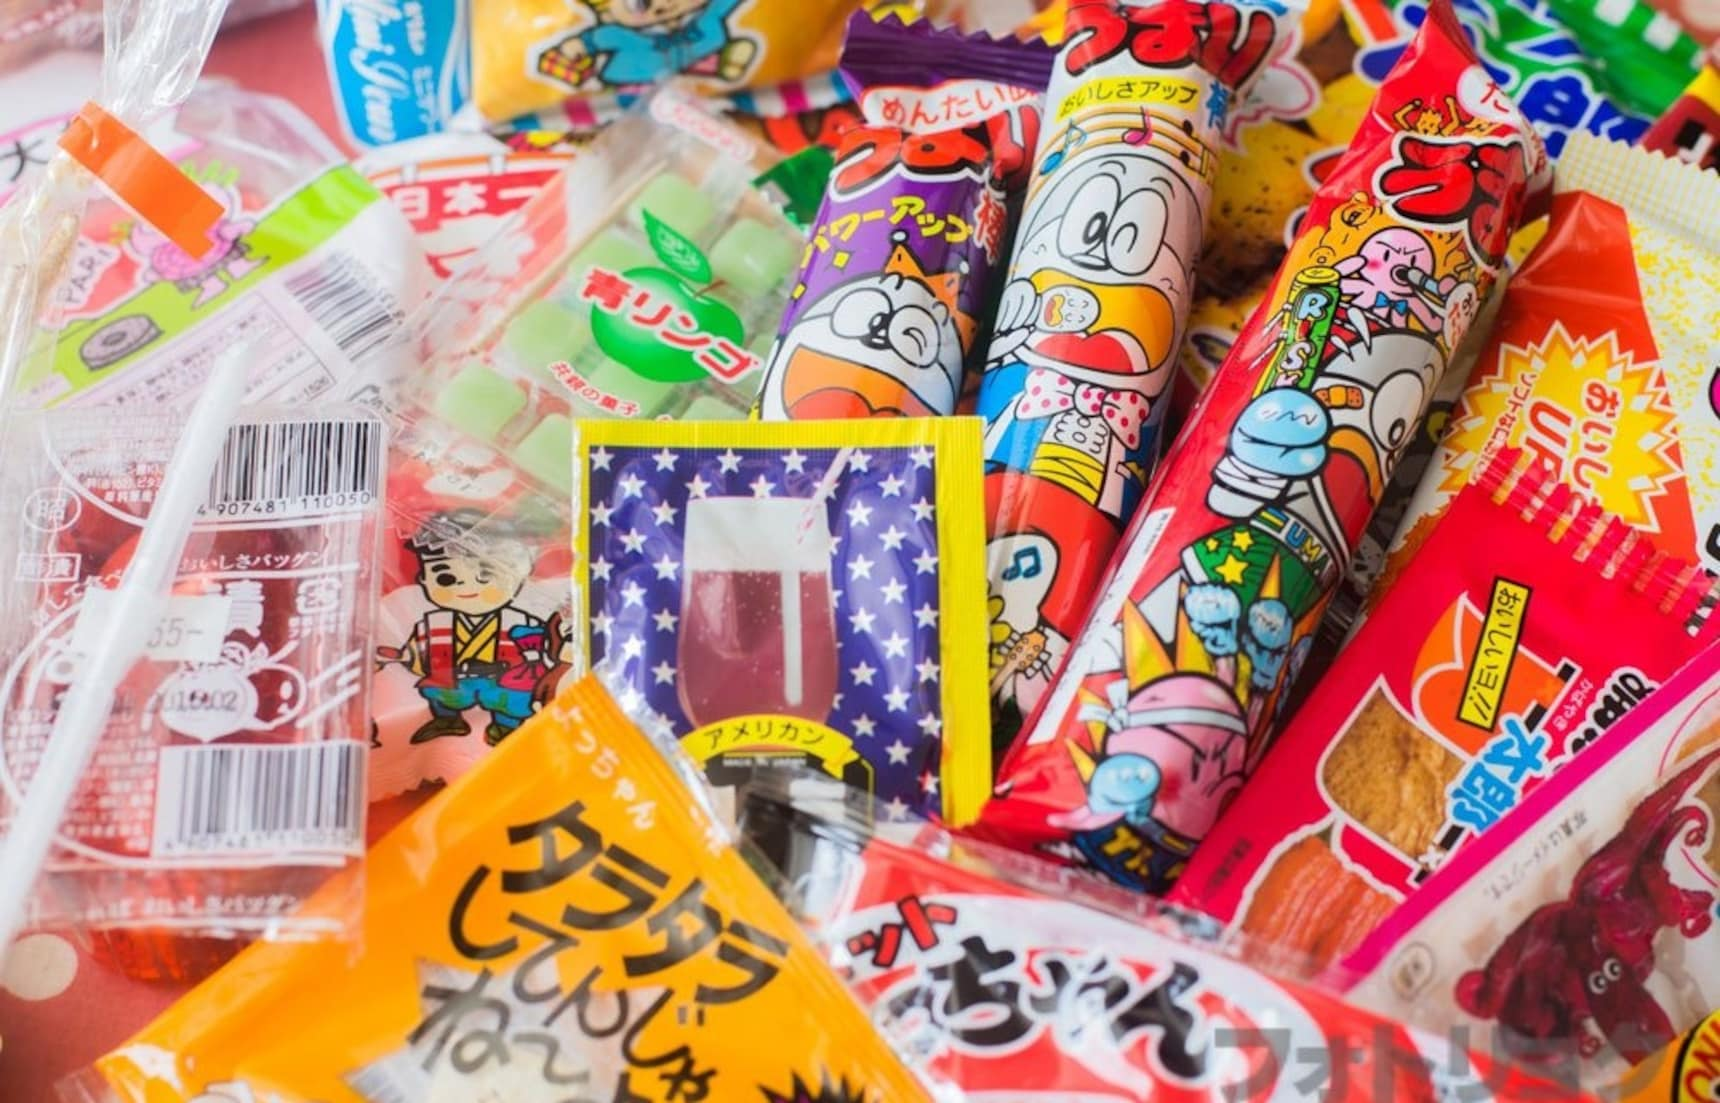 5 Nostalgic 'Dagashi' Treats